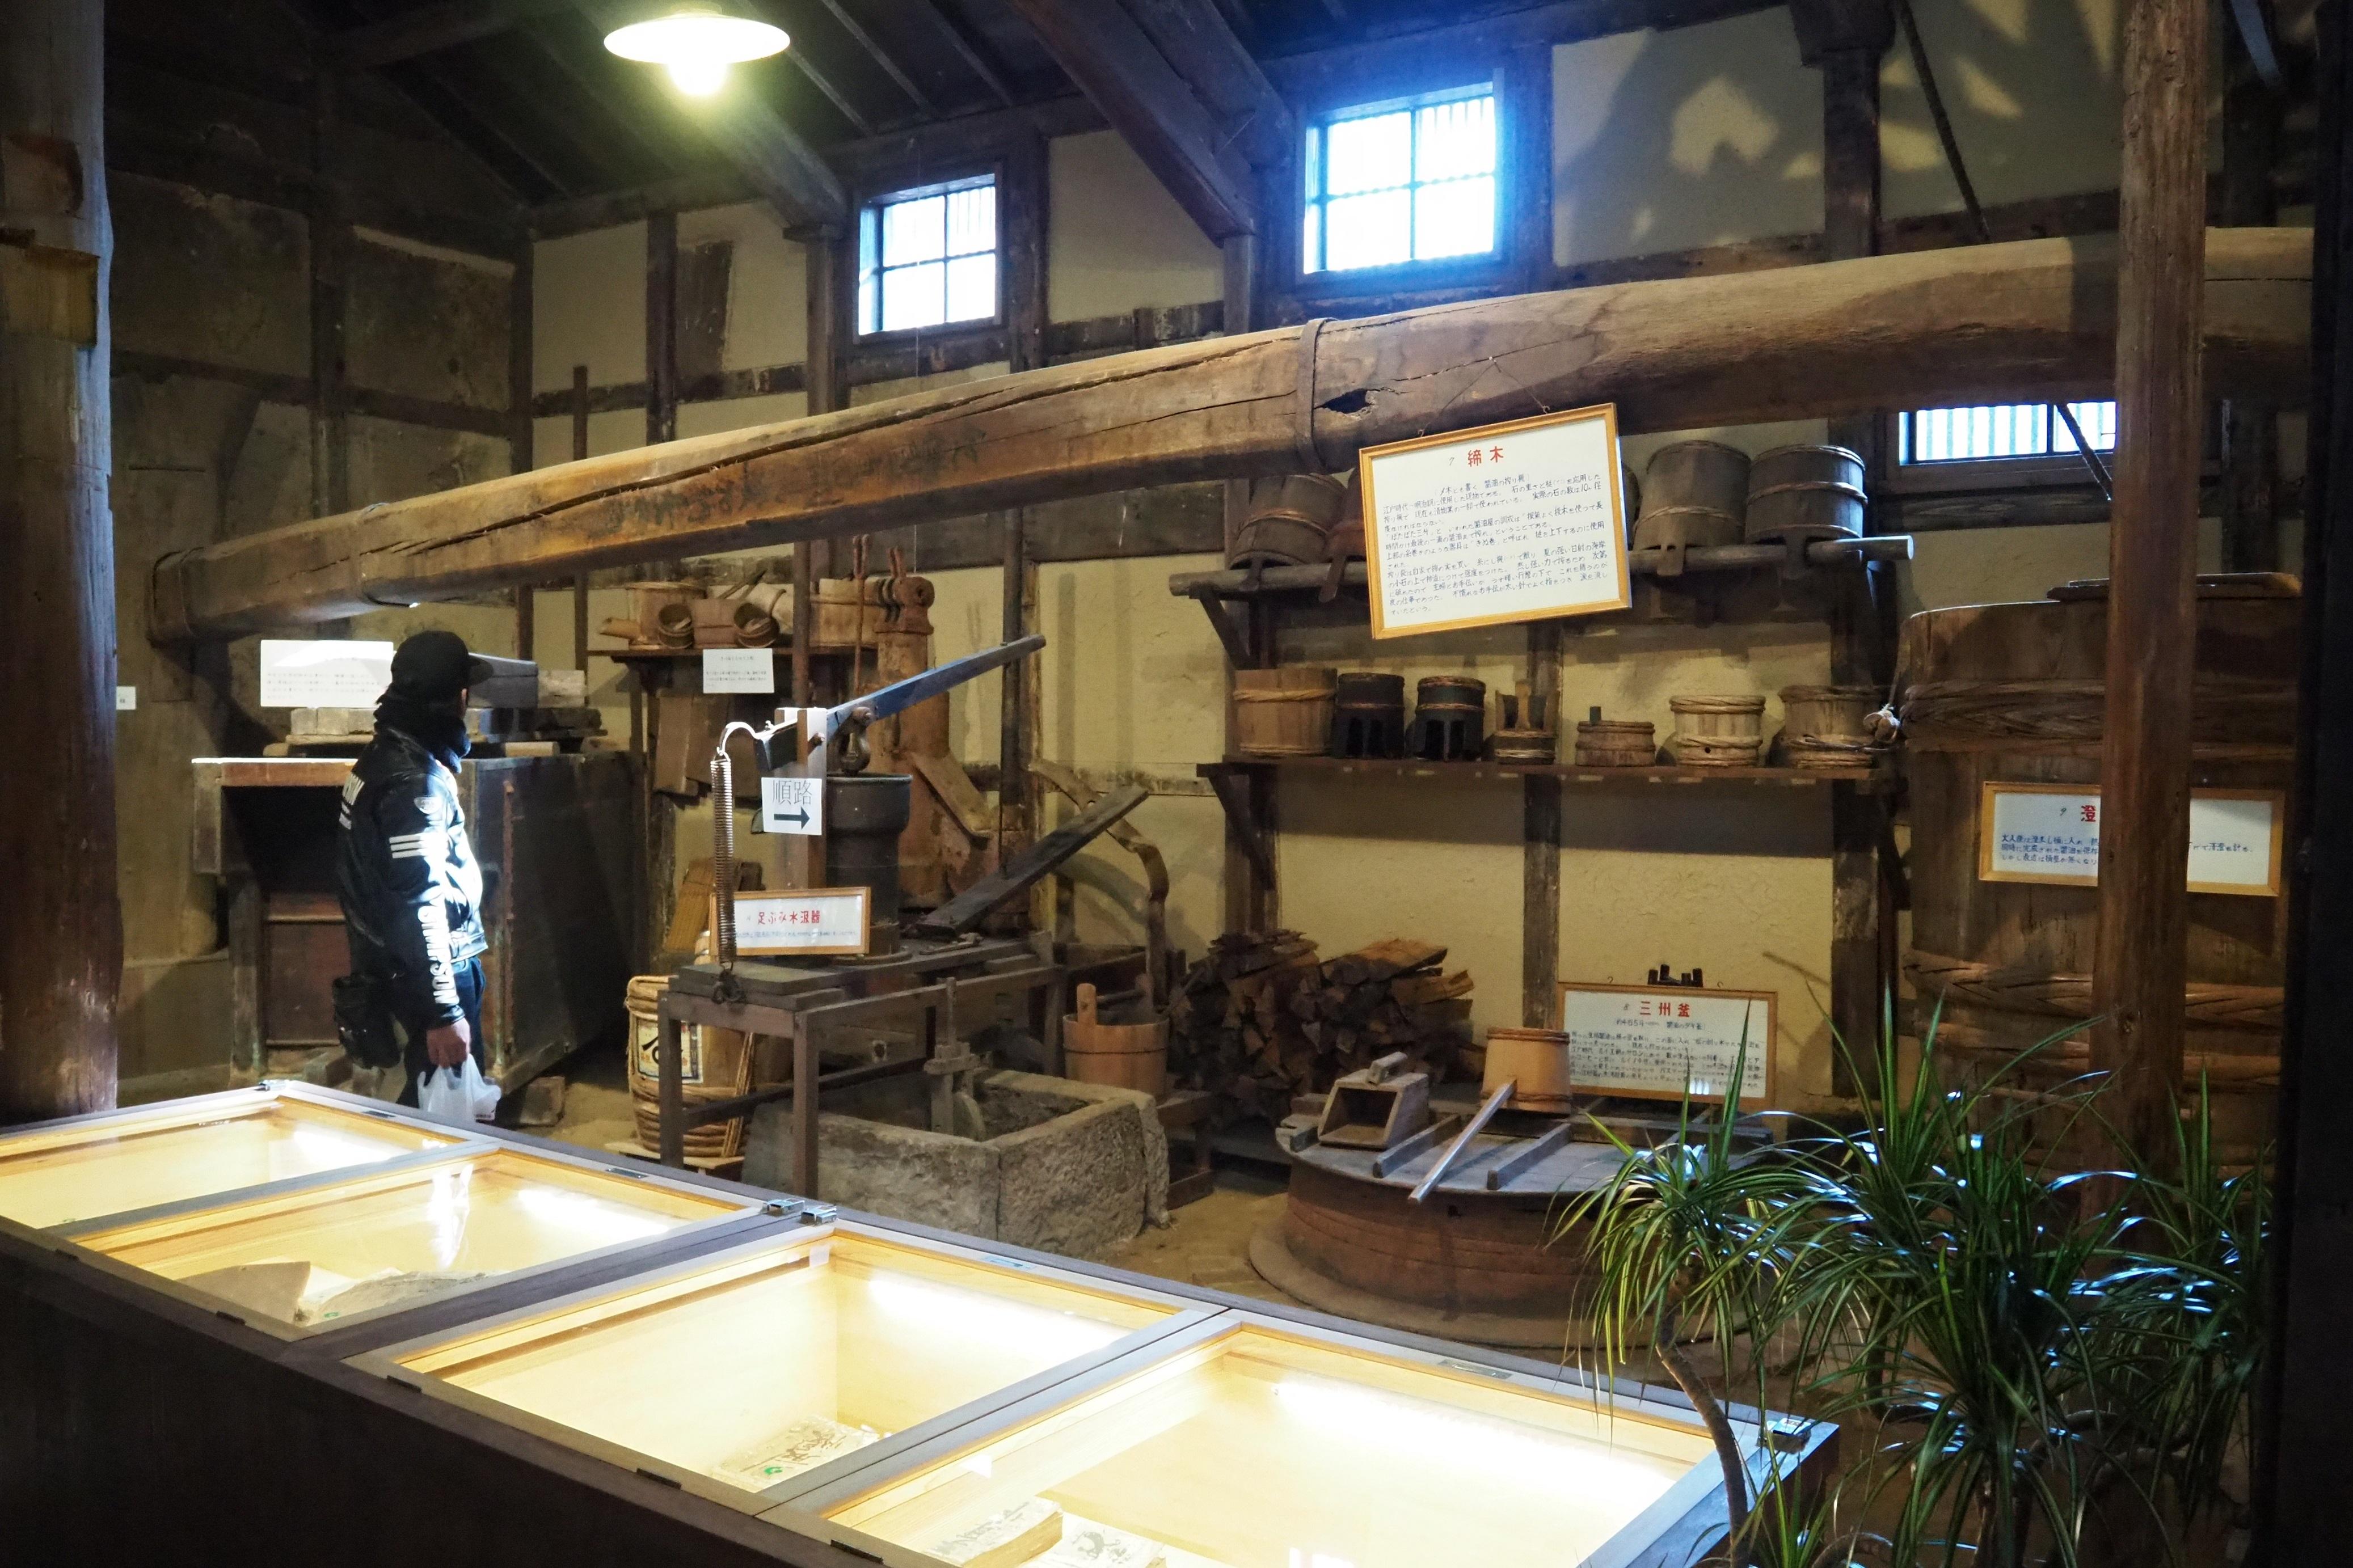 motorcycle-touring-blog-wakayama-yuasatown-soysauce-kadochou-museum-3.jpg